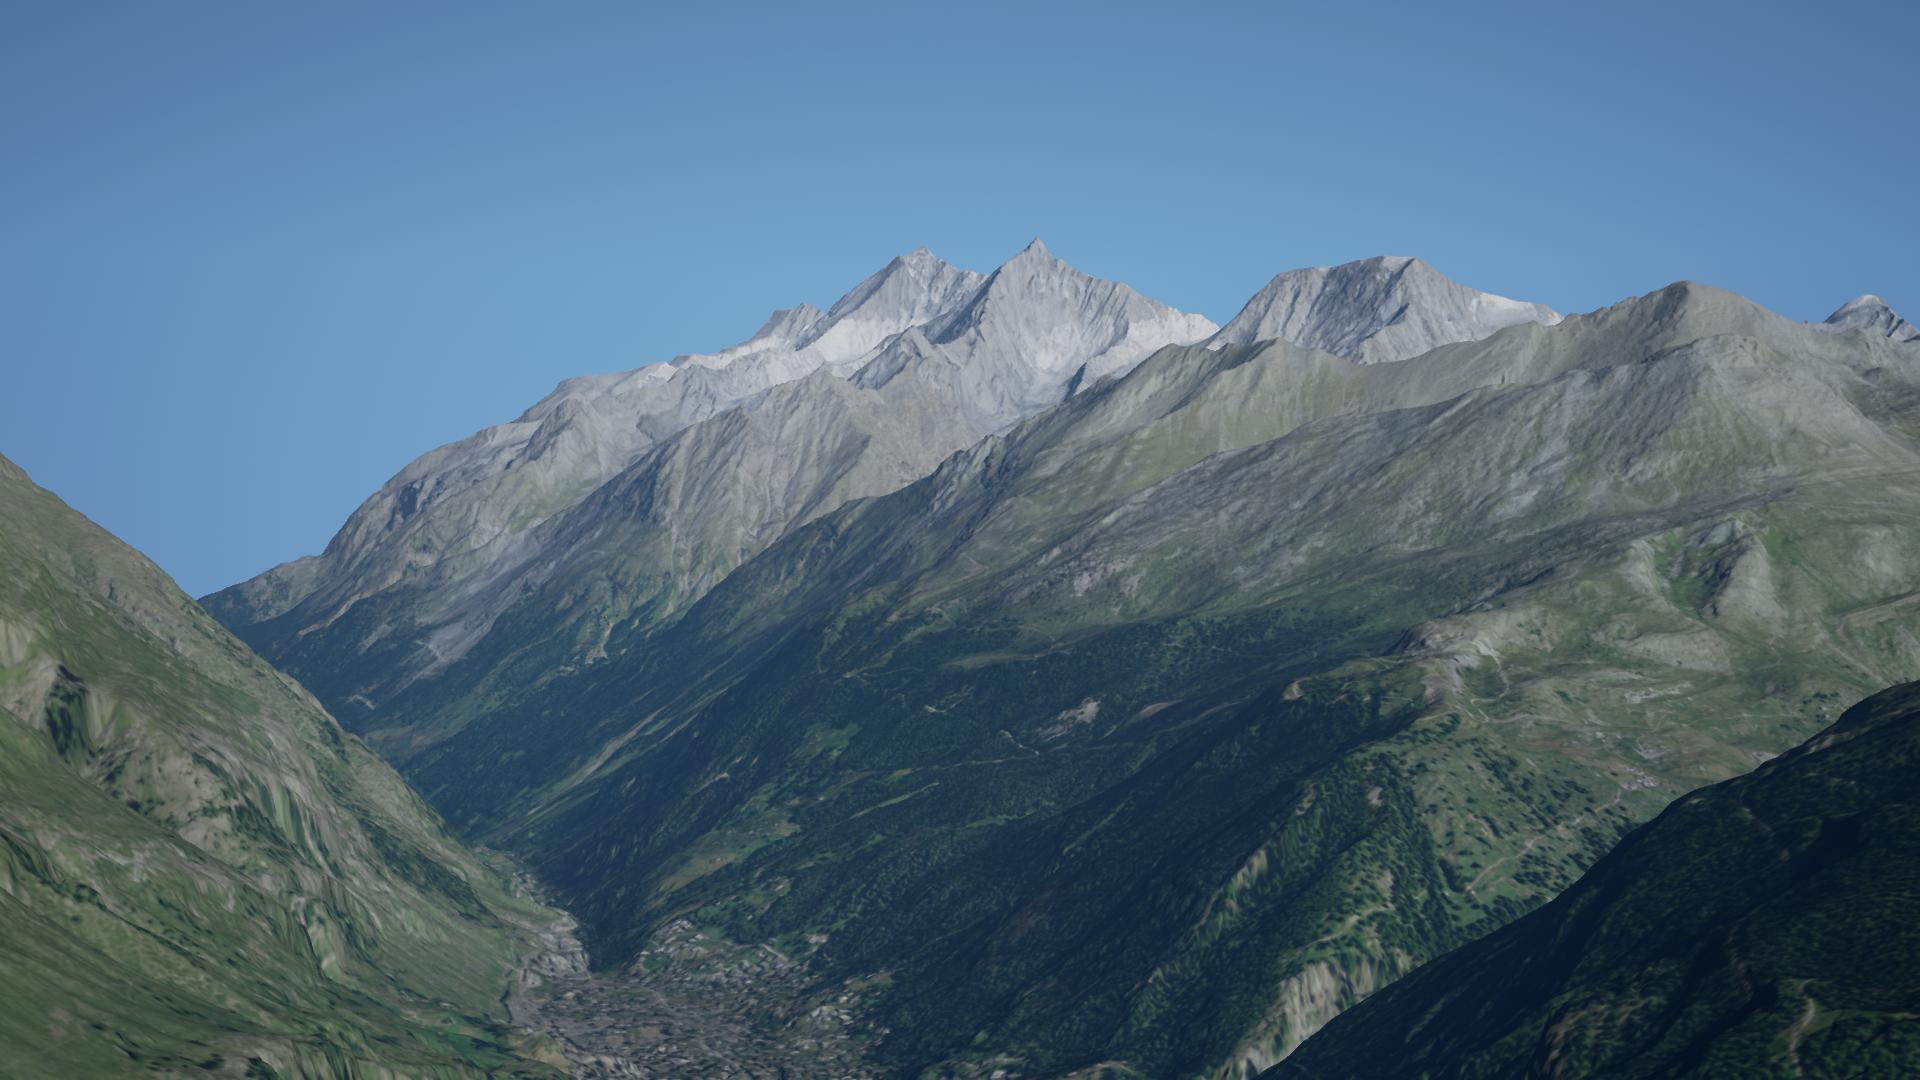 mountain without snow 2